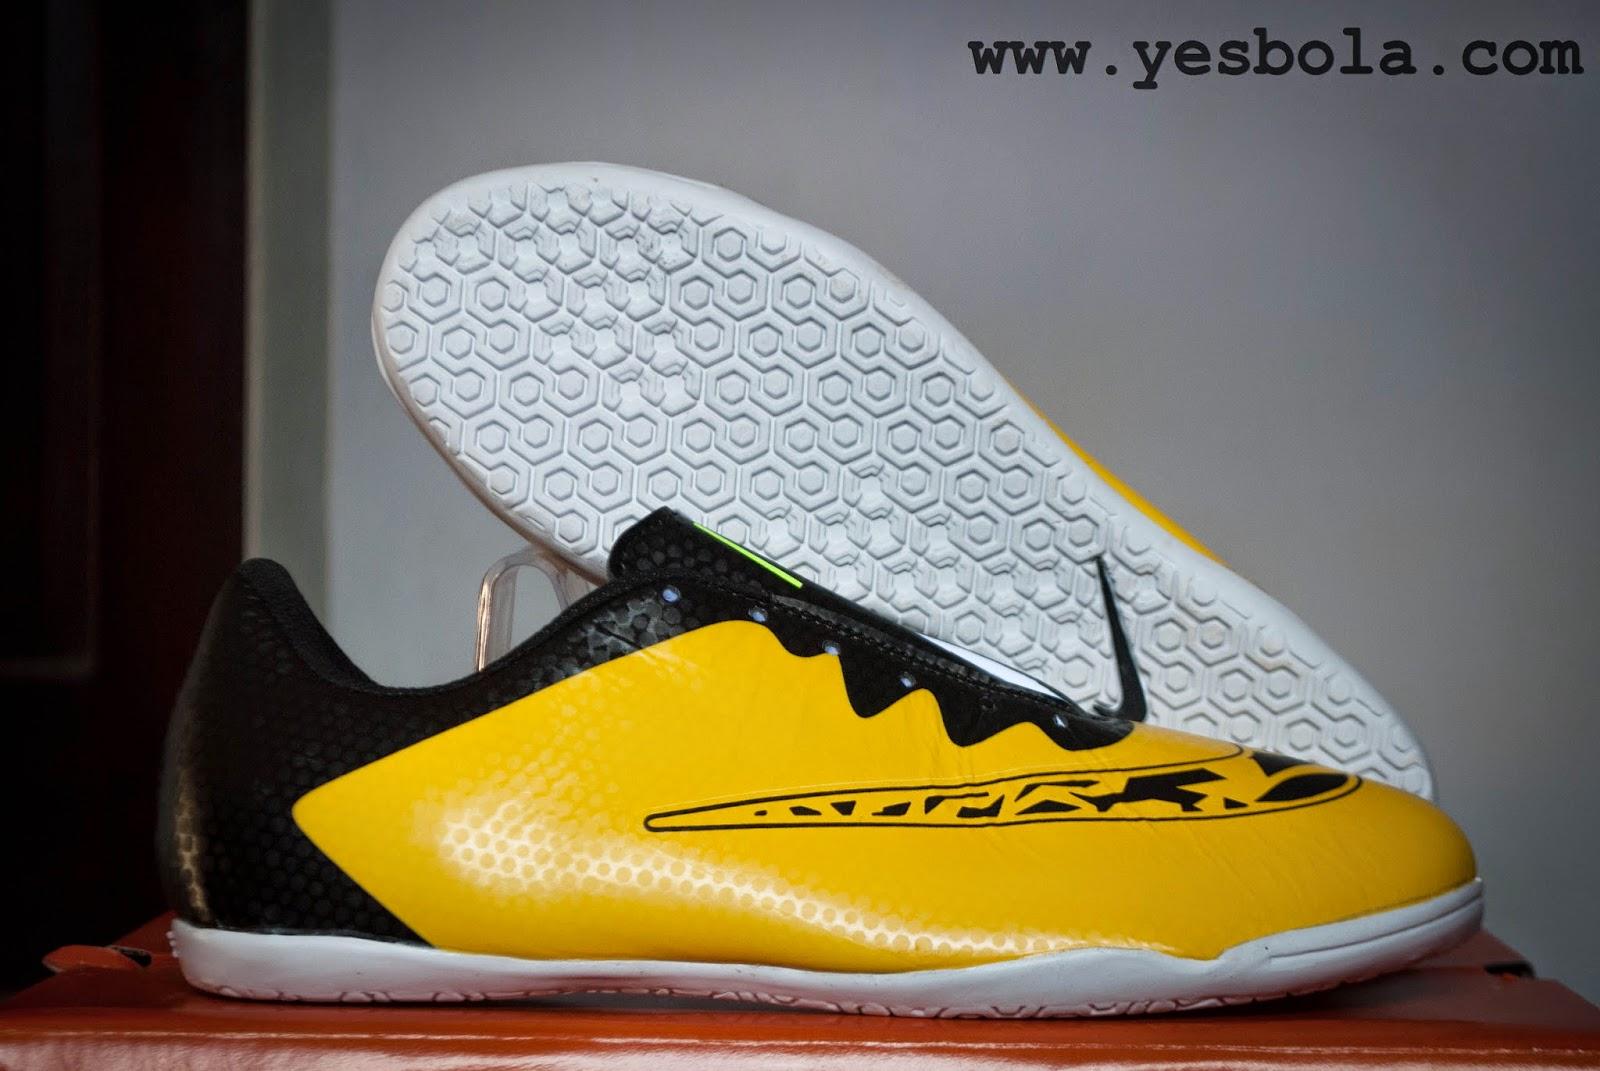 Nike New Elastico II Kuning